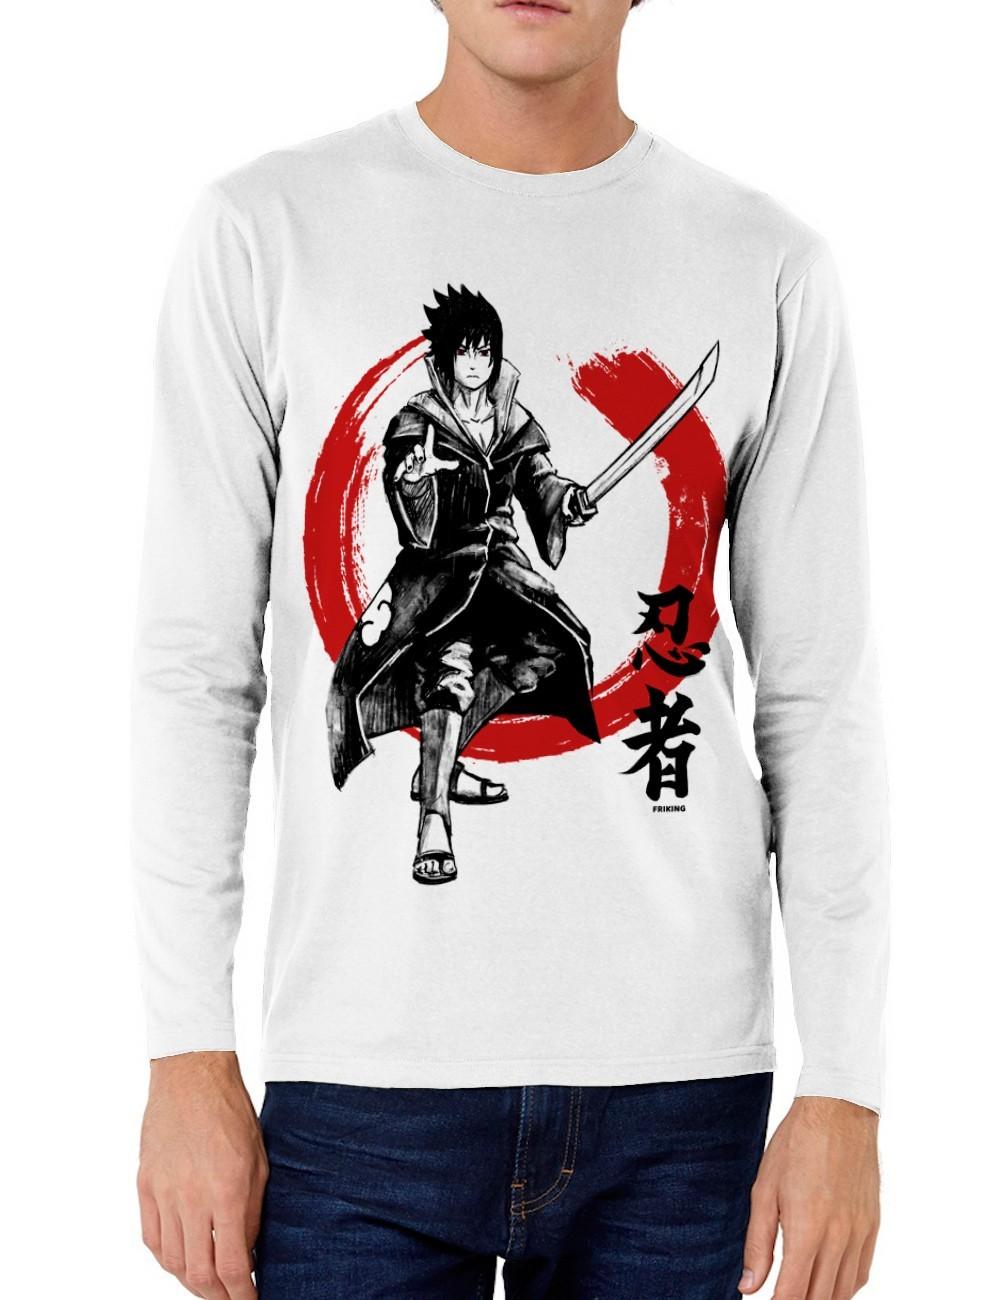 Ninja sketch